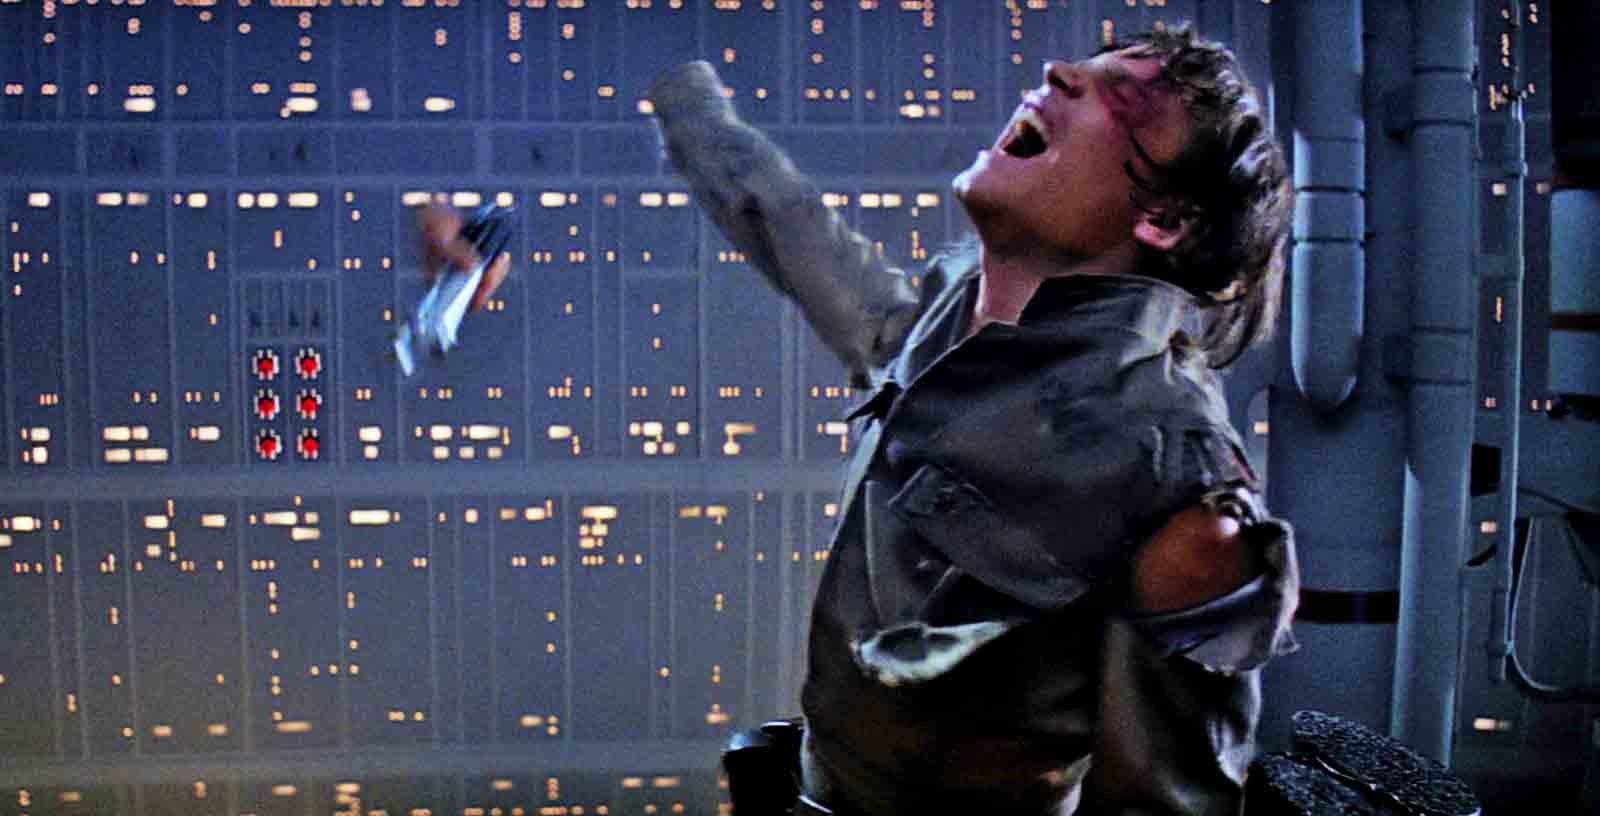 Star Wars: The Force Awakens: Mark Hamill confirms opening shot was originally of Luke's severed hand